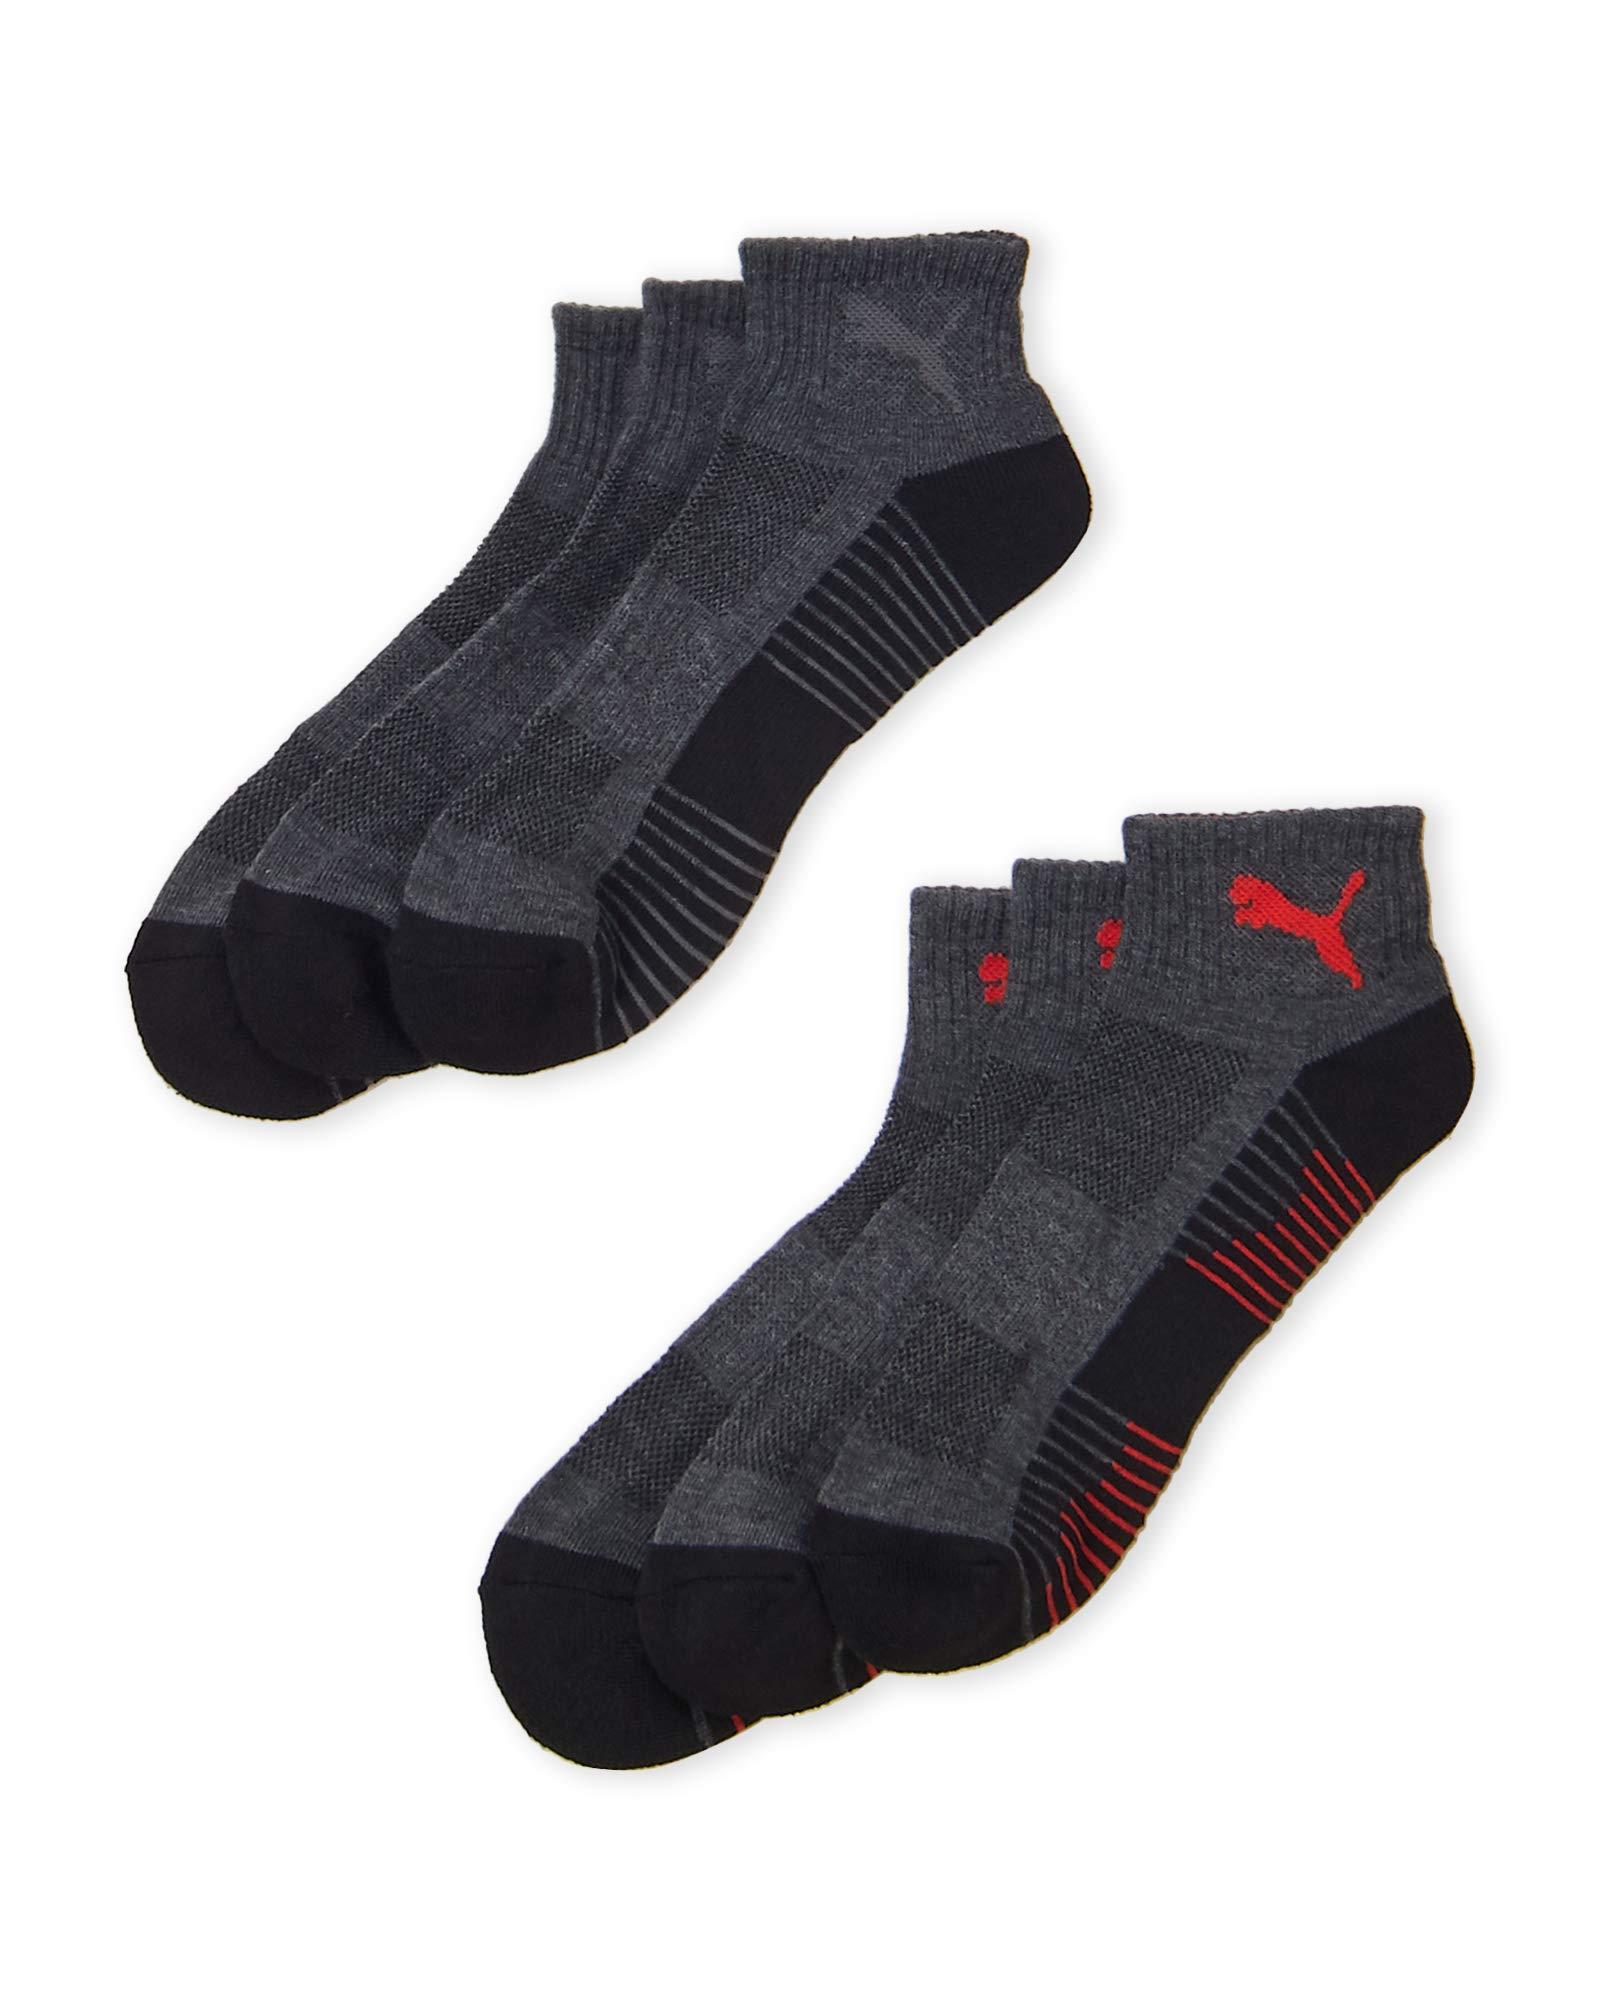 PUMA Men's PREMIUM QUALITY 6pk QUARTER Socks (BLACK RED), (12-6)